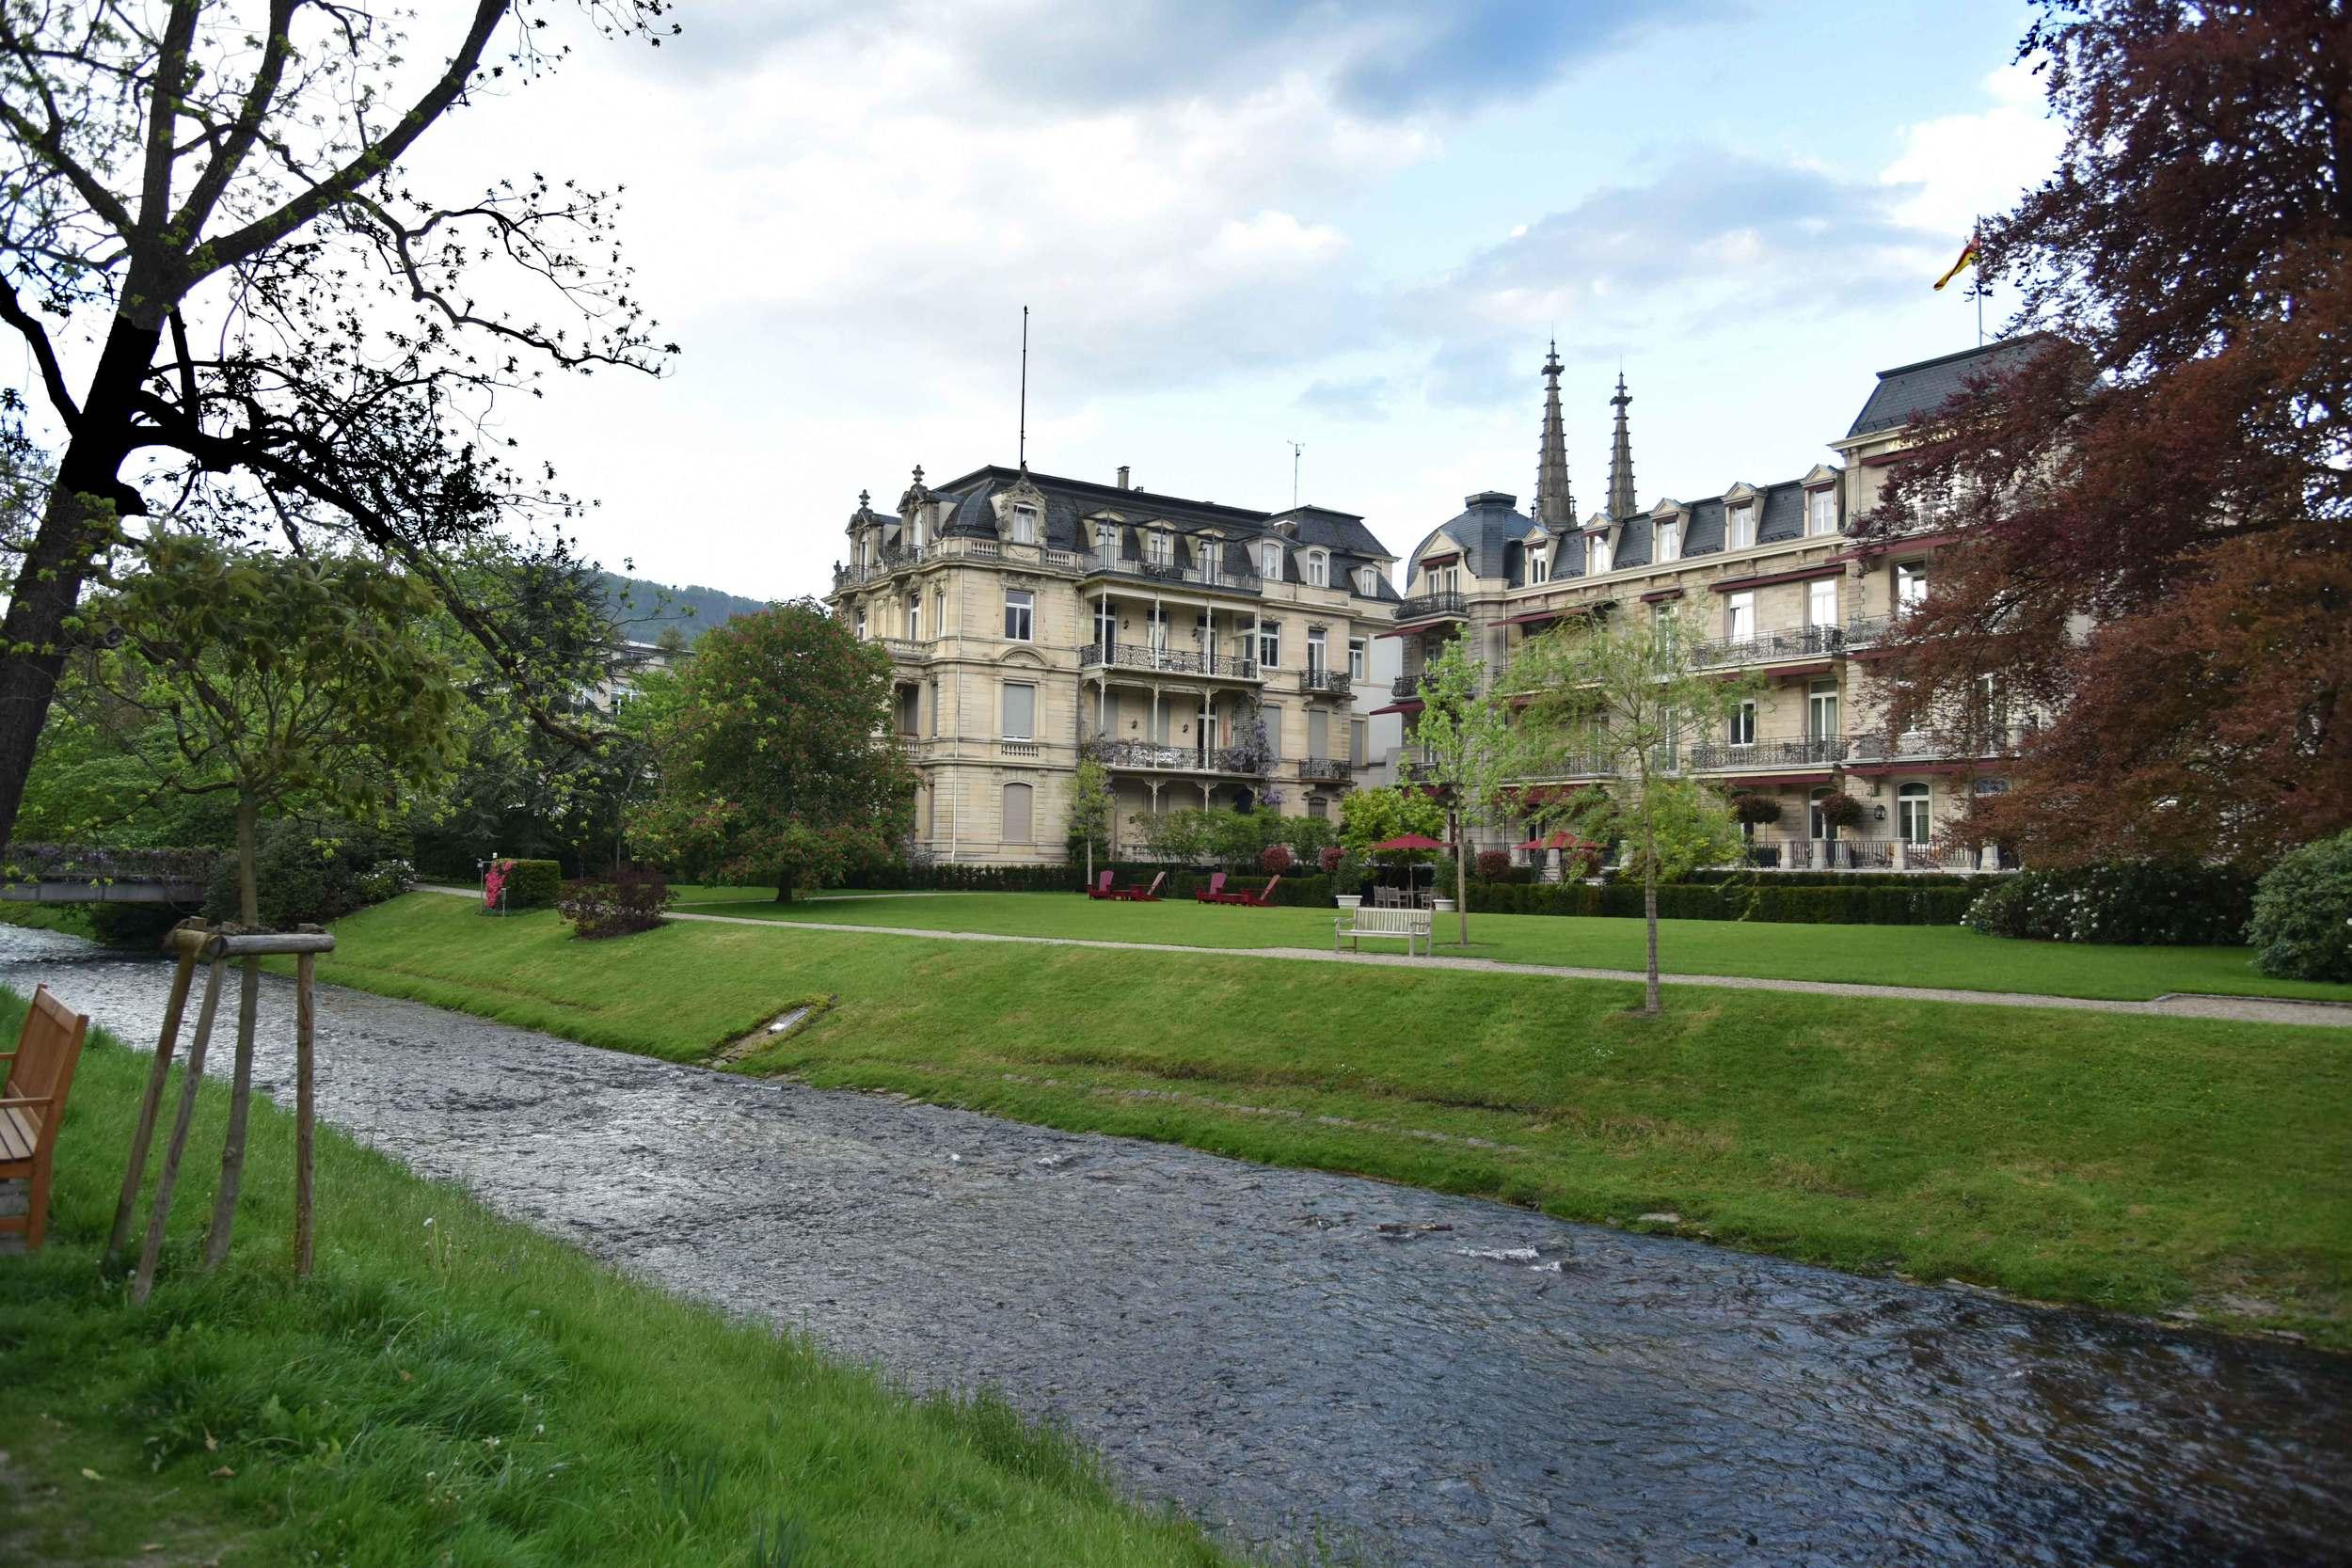 Brenners Park Hotel and Spa, Baden Baden, Germany. Image©sourcingstyle.com